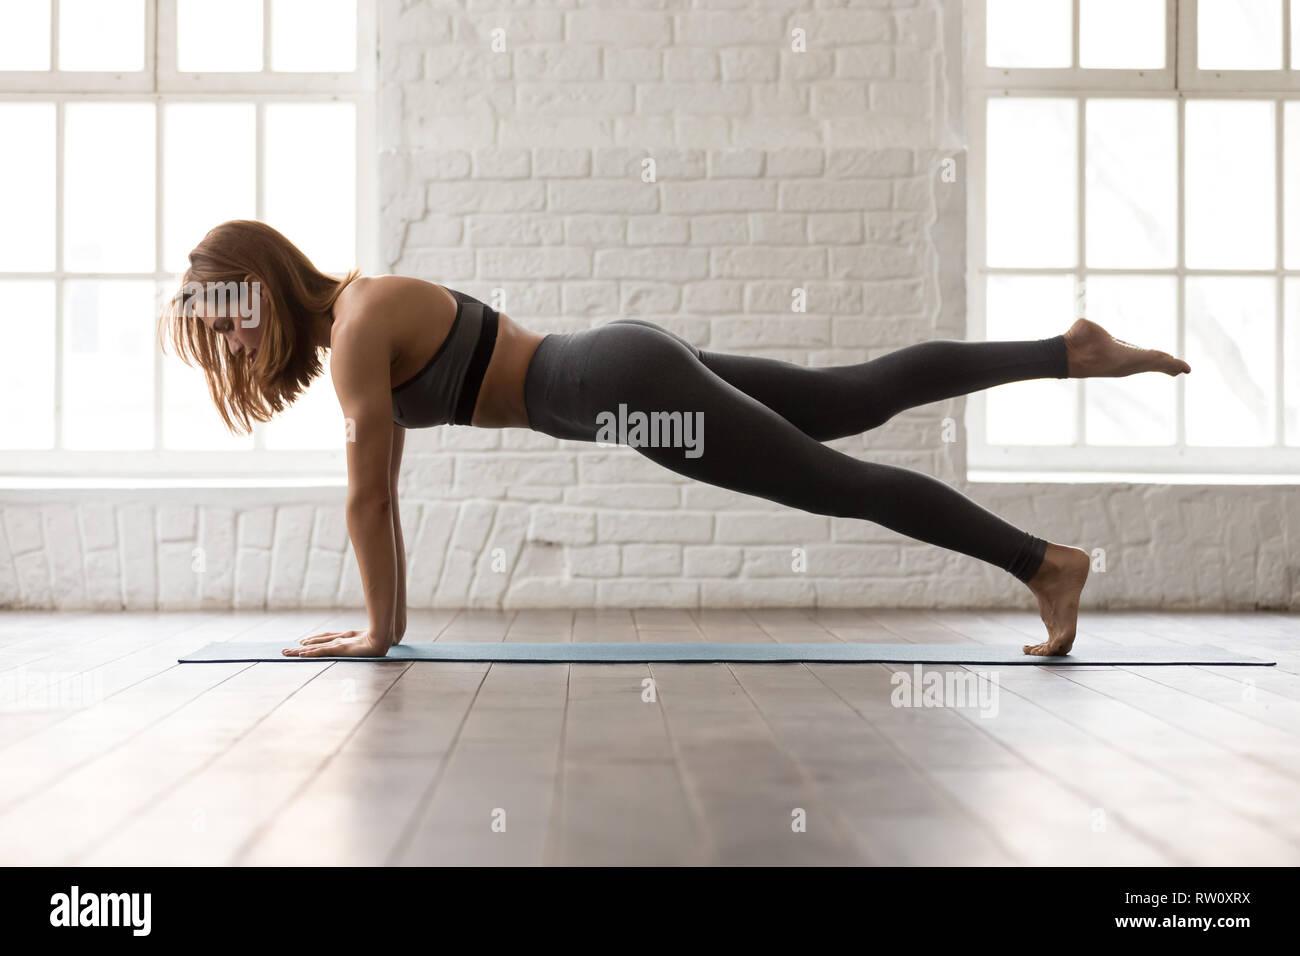 Mujer practicando yoga, empuje ups o sai prensa ejercicio, tablón Foto de stock